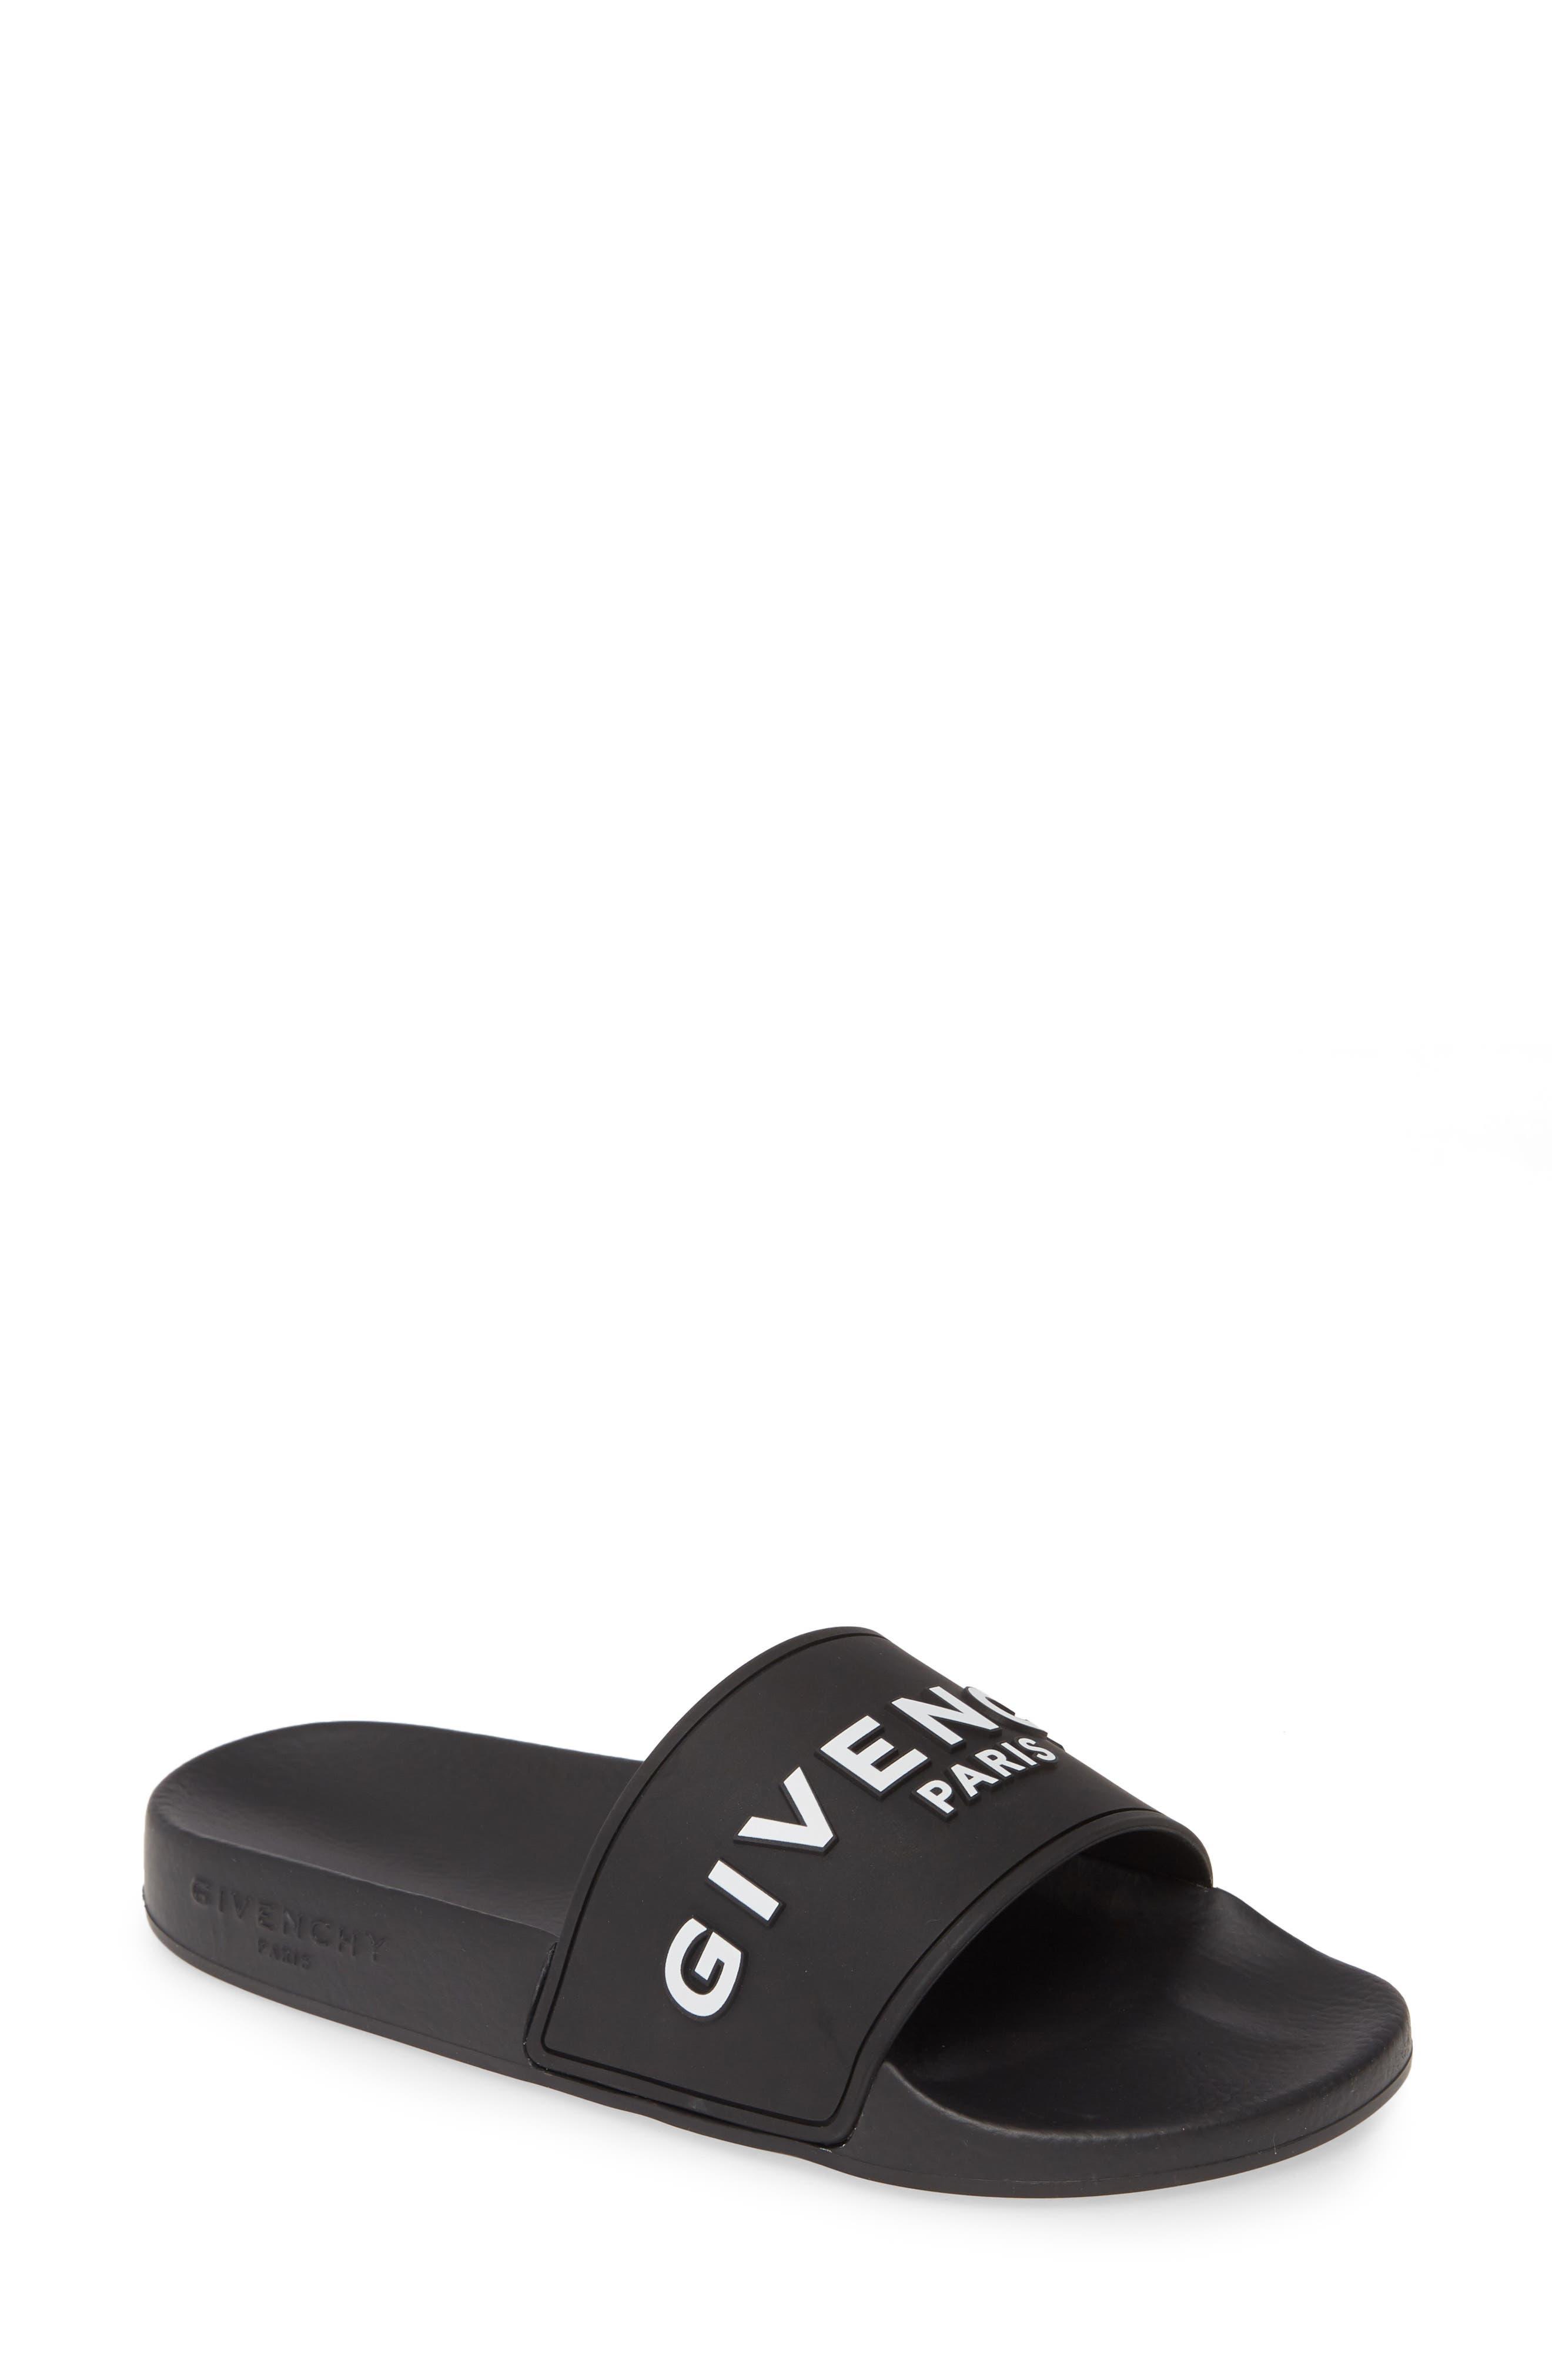 7bf10817c5301 Women's Slide Sandals | Nordstrom